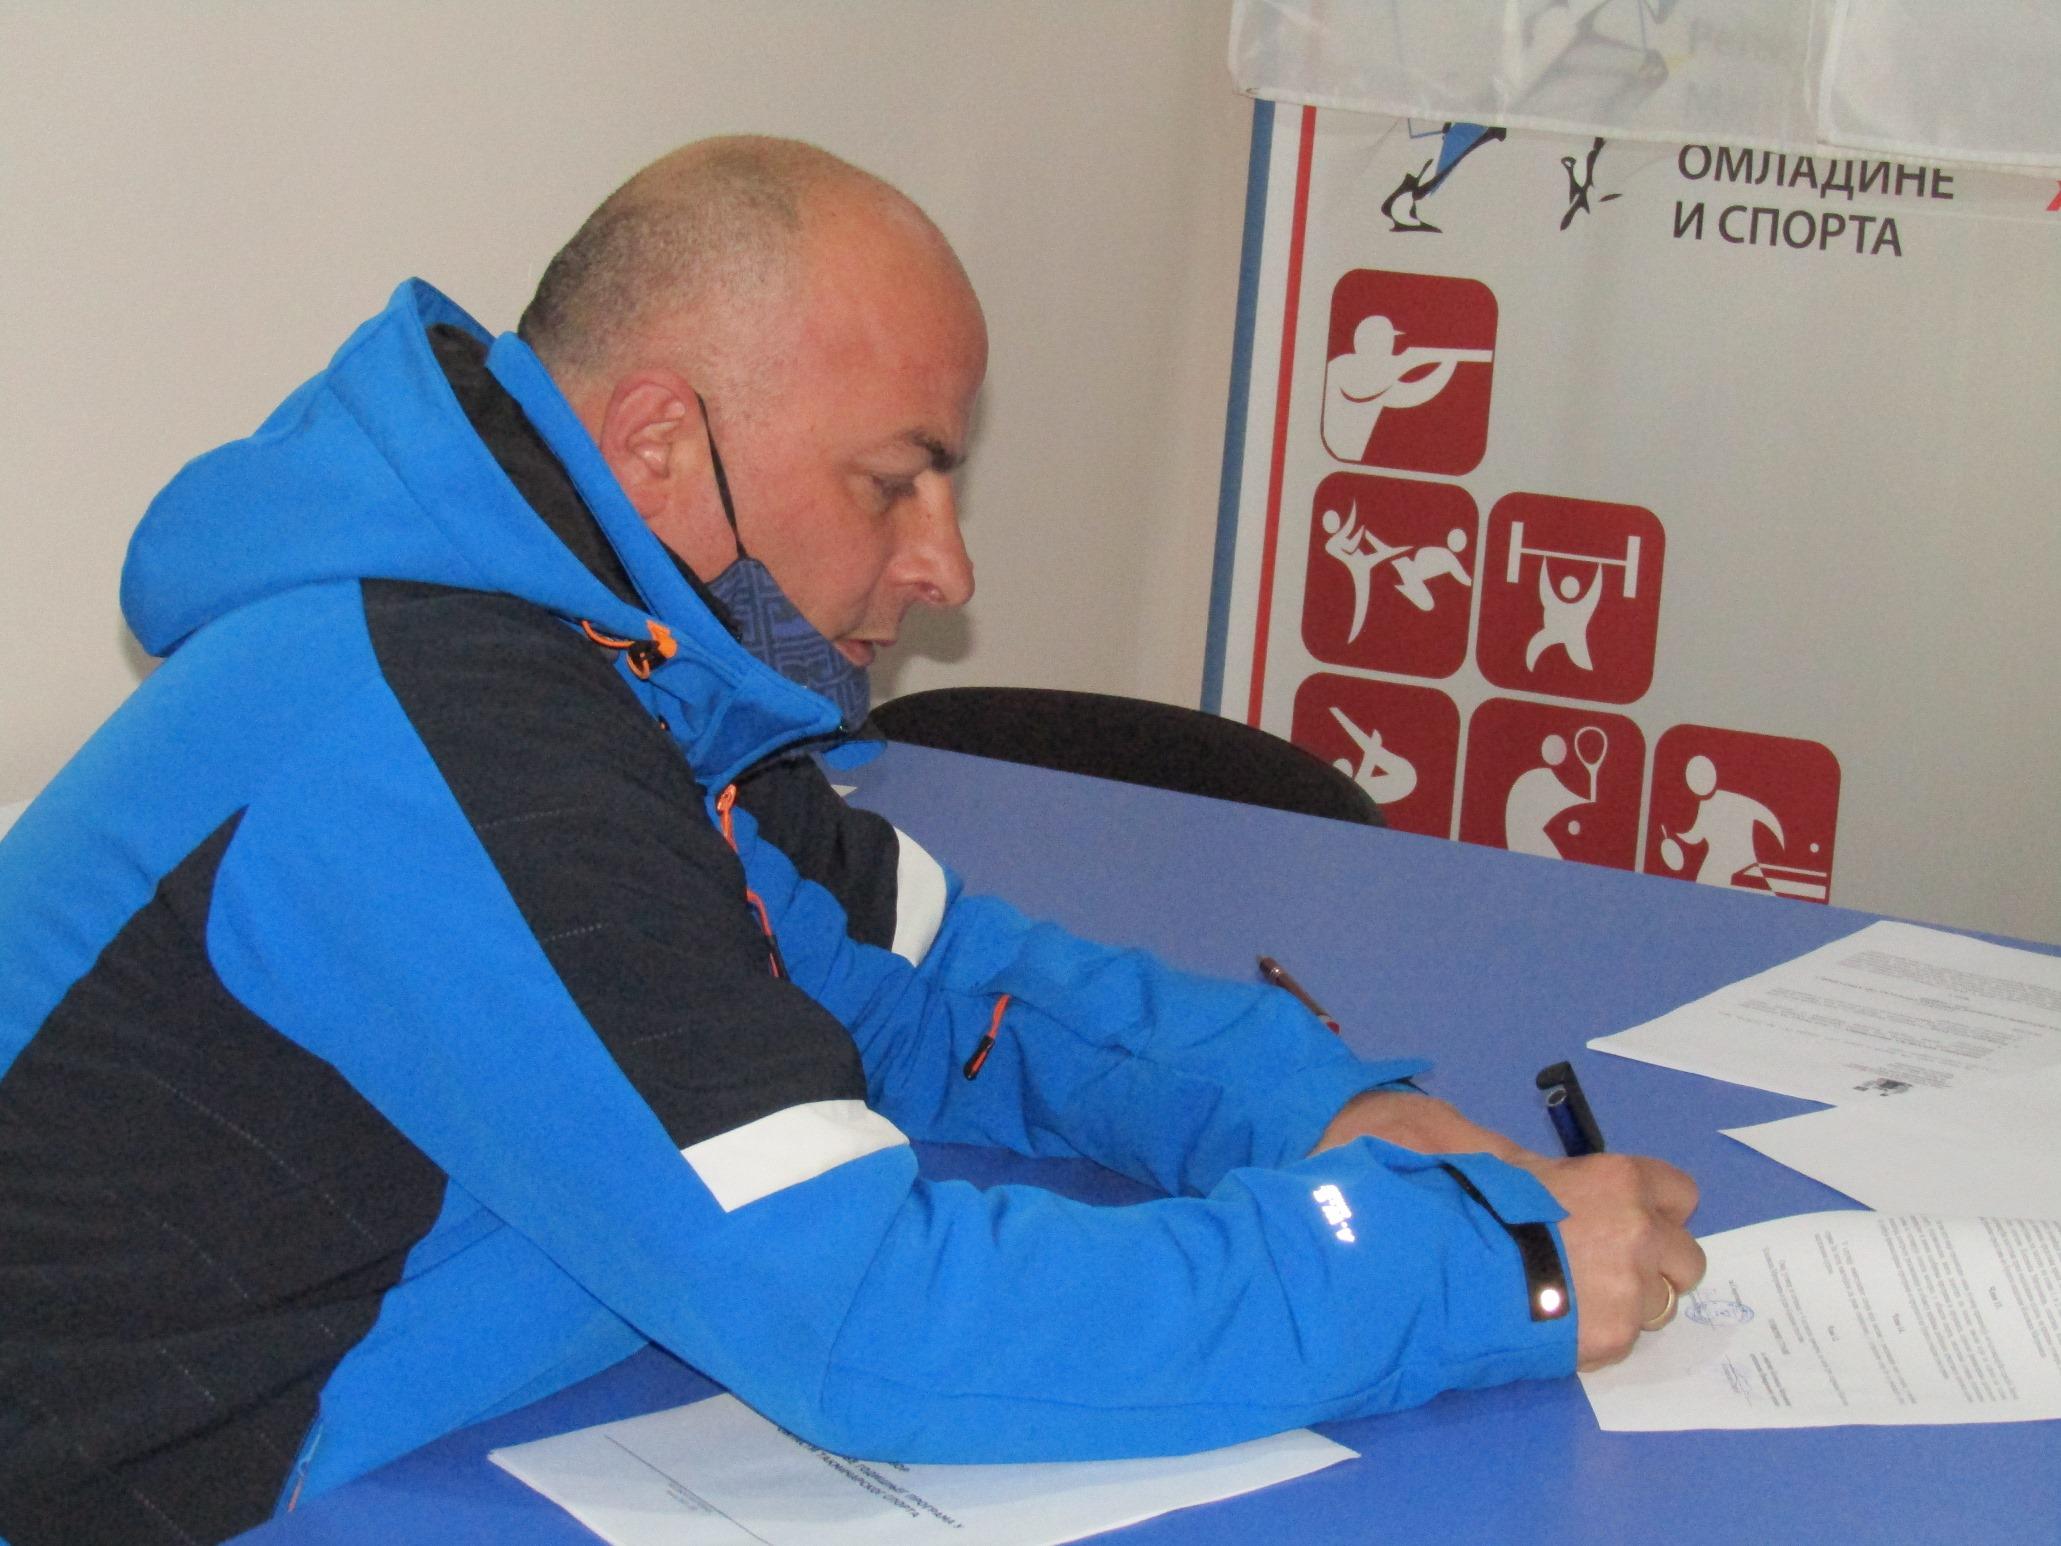 kosovska-mitrovica-lokalna-samouprava-podrzava-sportske-klubove-sa-12-miliona-dinara